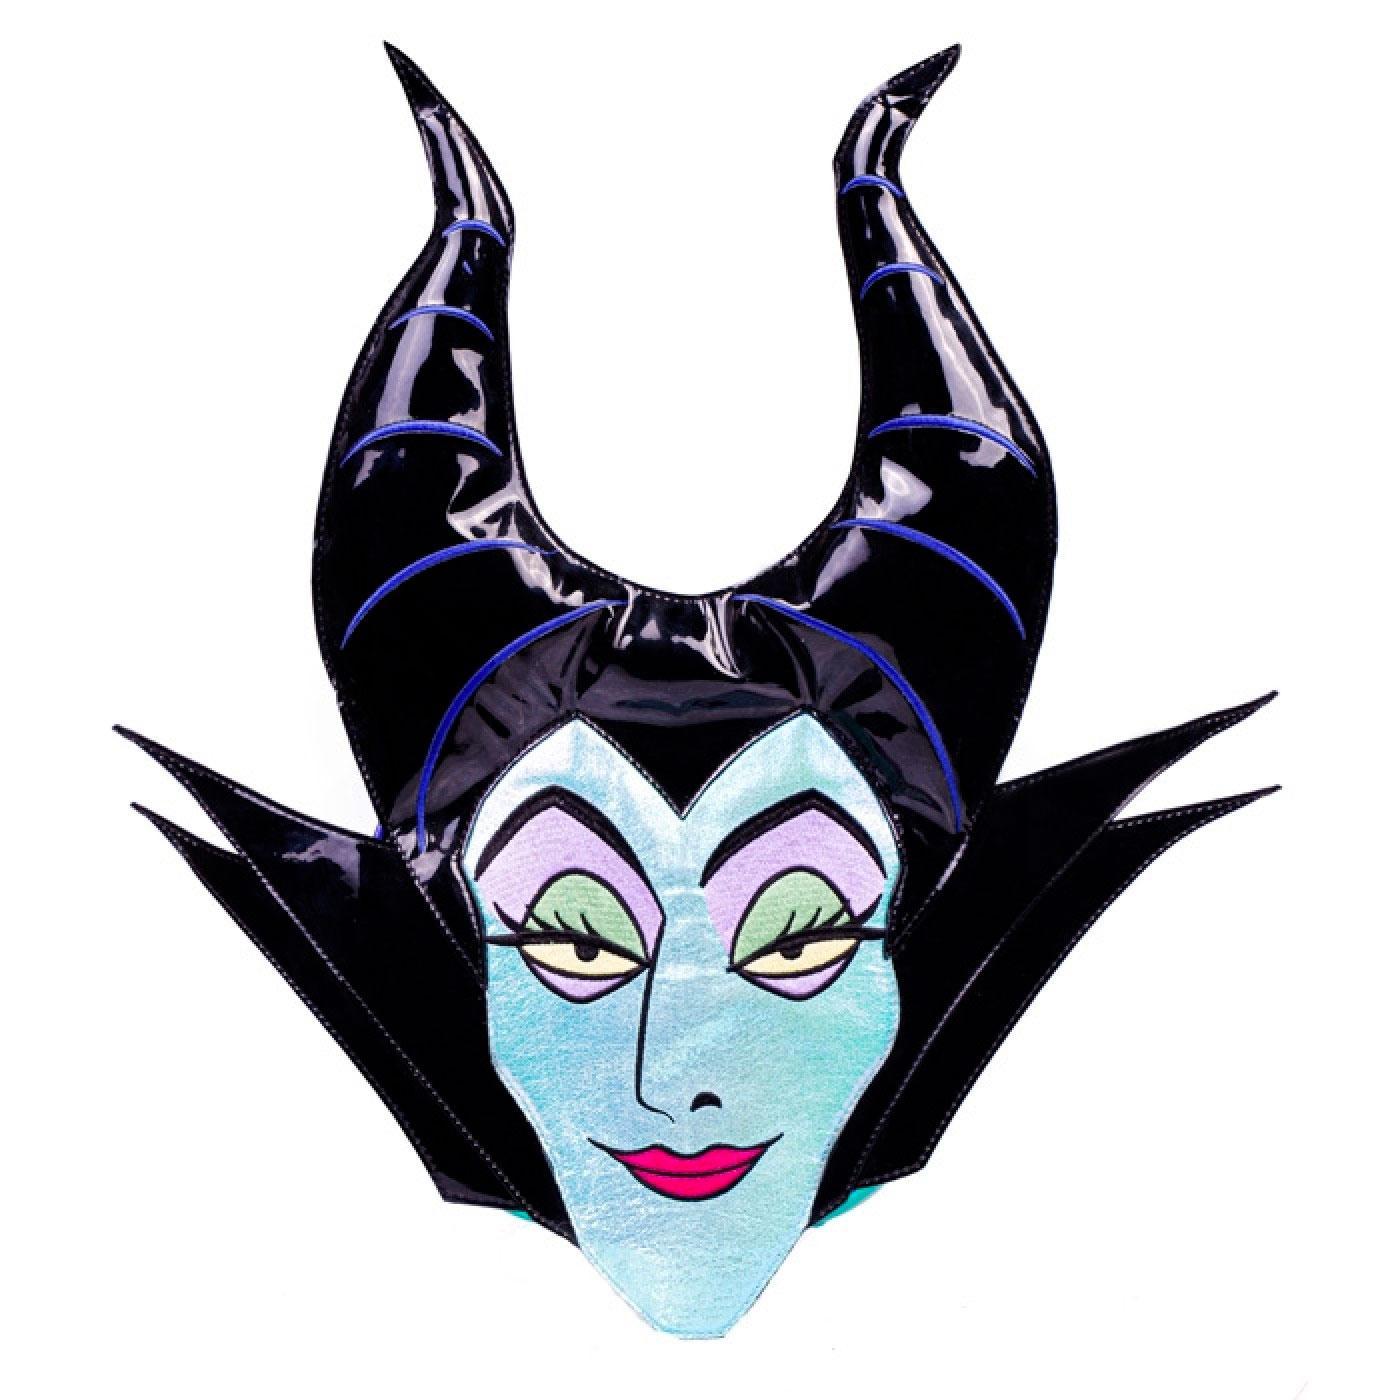 Maleficent IRREGULAR CHOICE Sleeping Beauty Bag